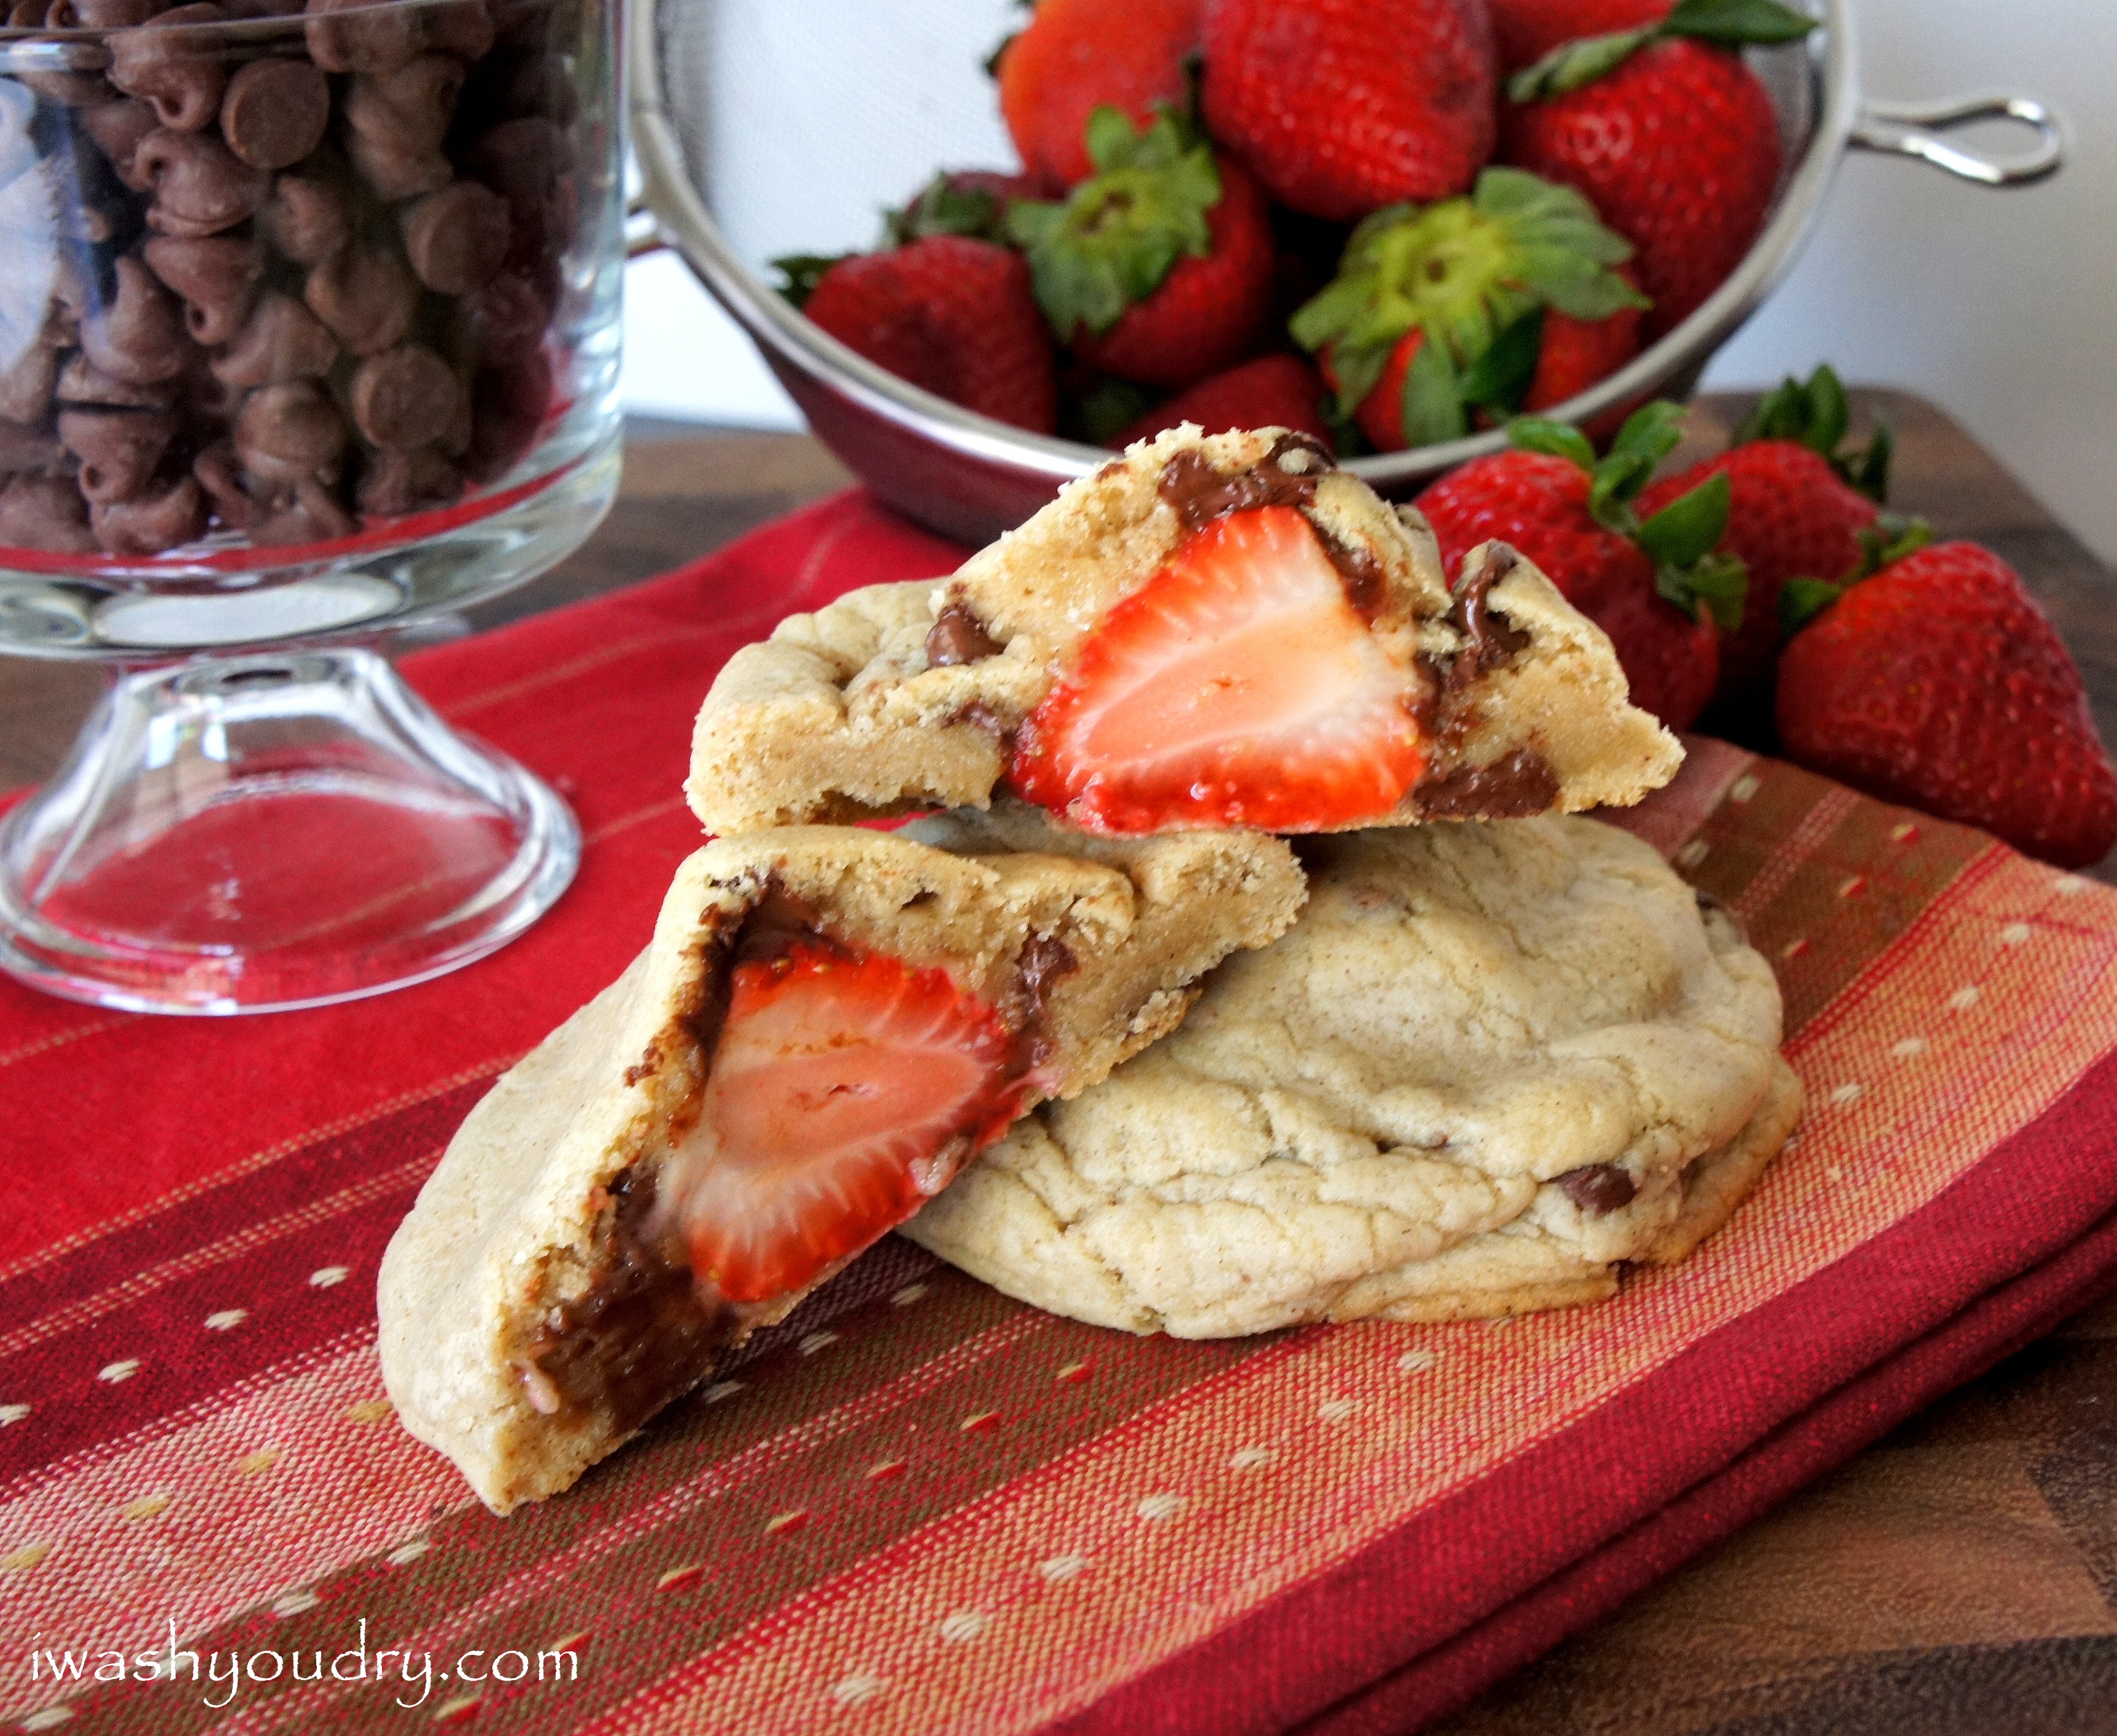 Strawberry stuffed Chocolate Chip Cinnamon Cookies